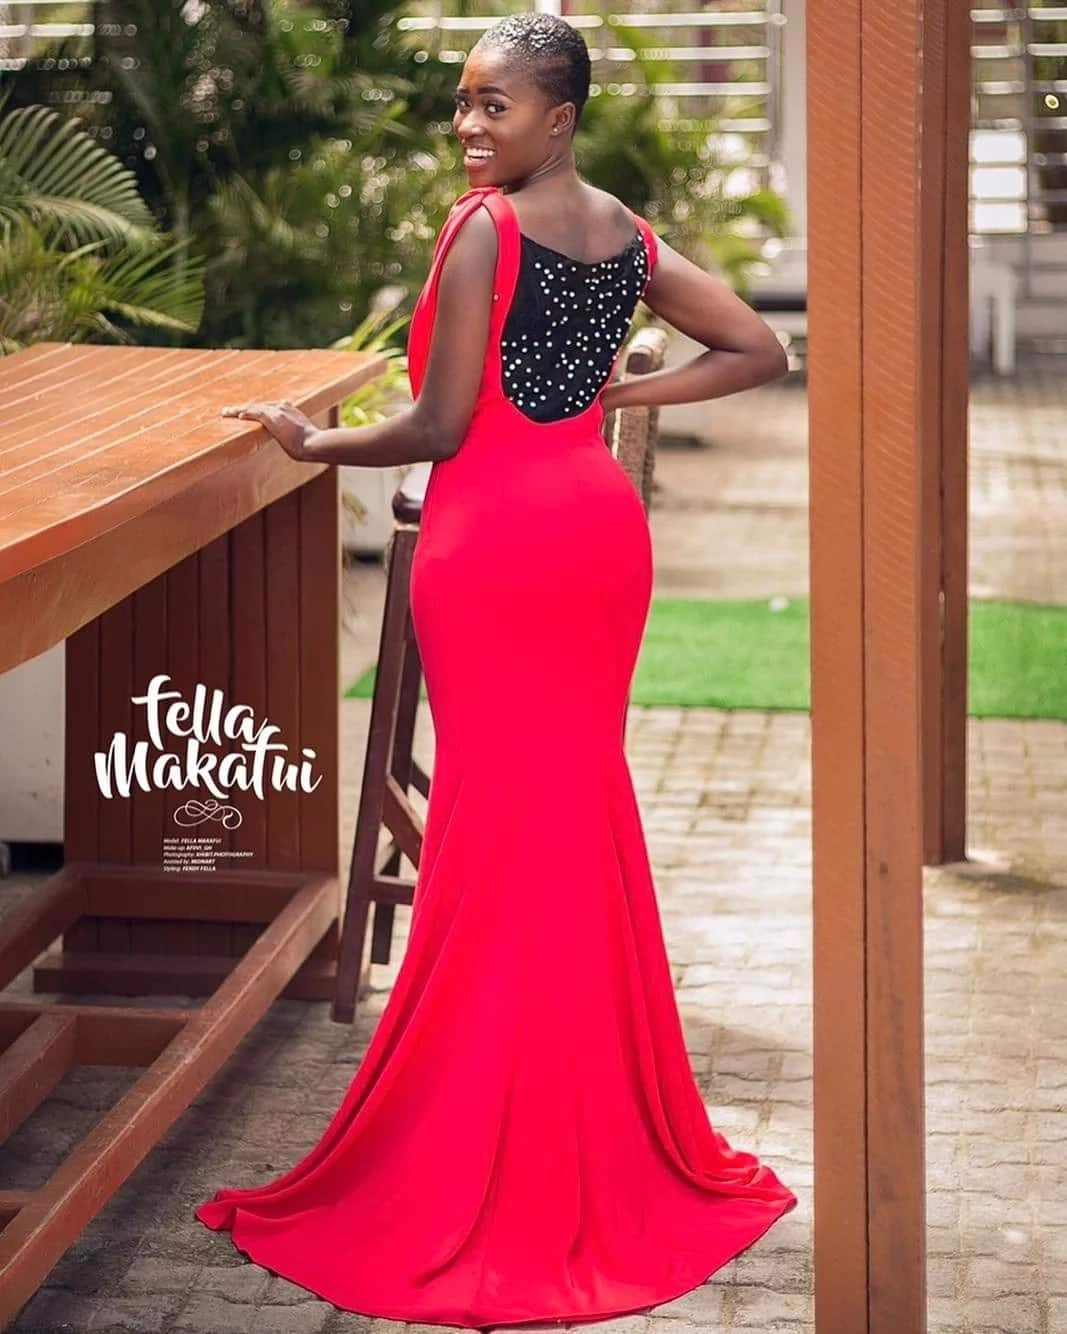 Fella Makafui wearing a red and black dress